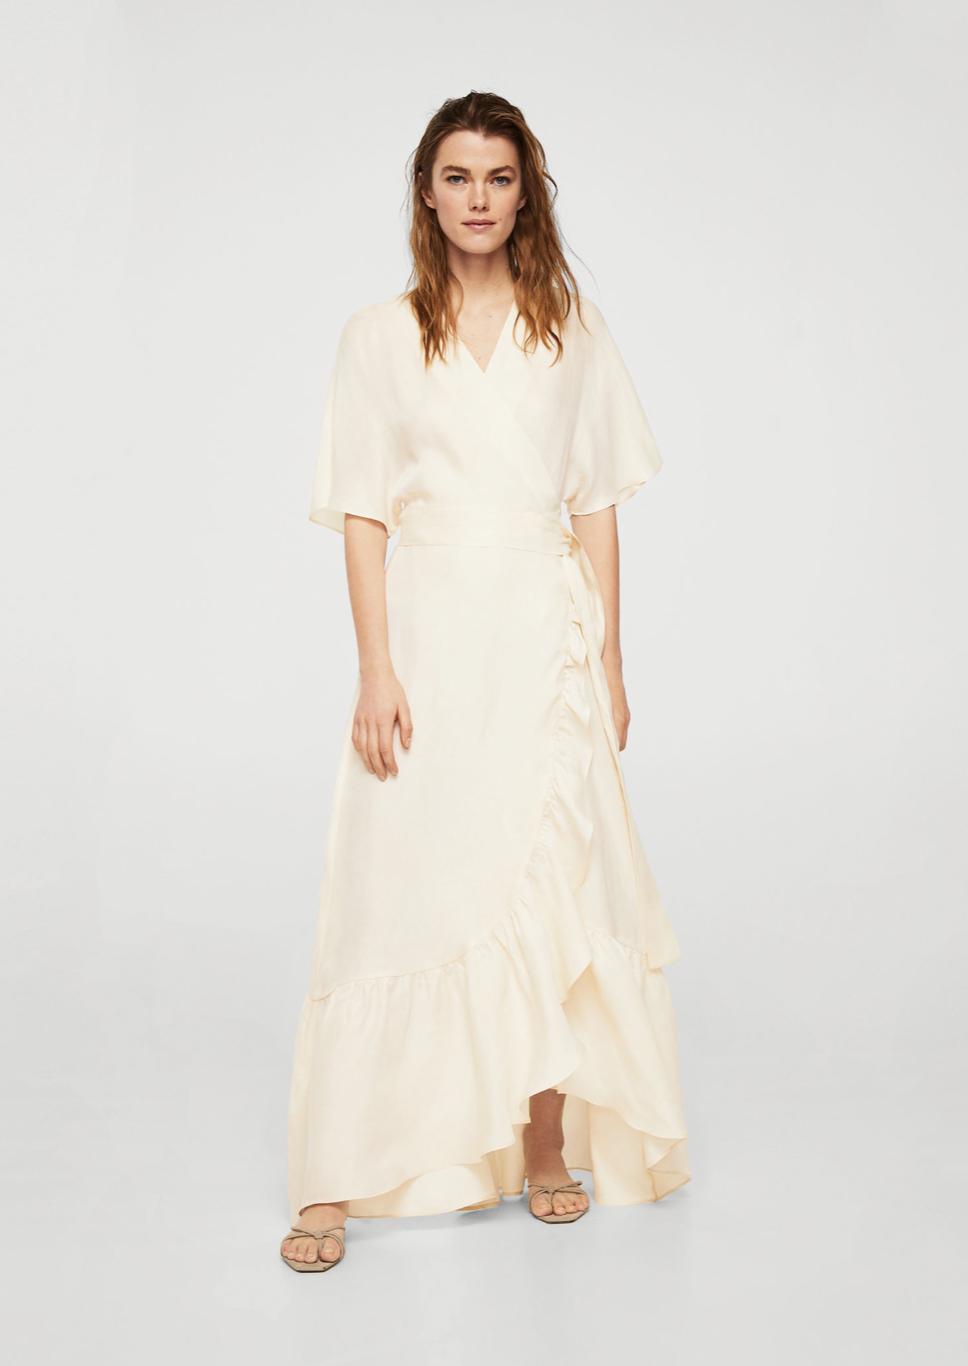 ruffle wrap dress – $149.99